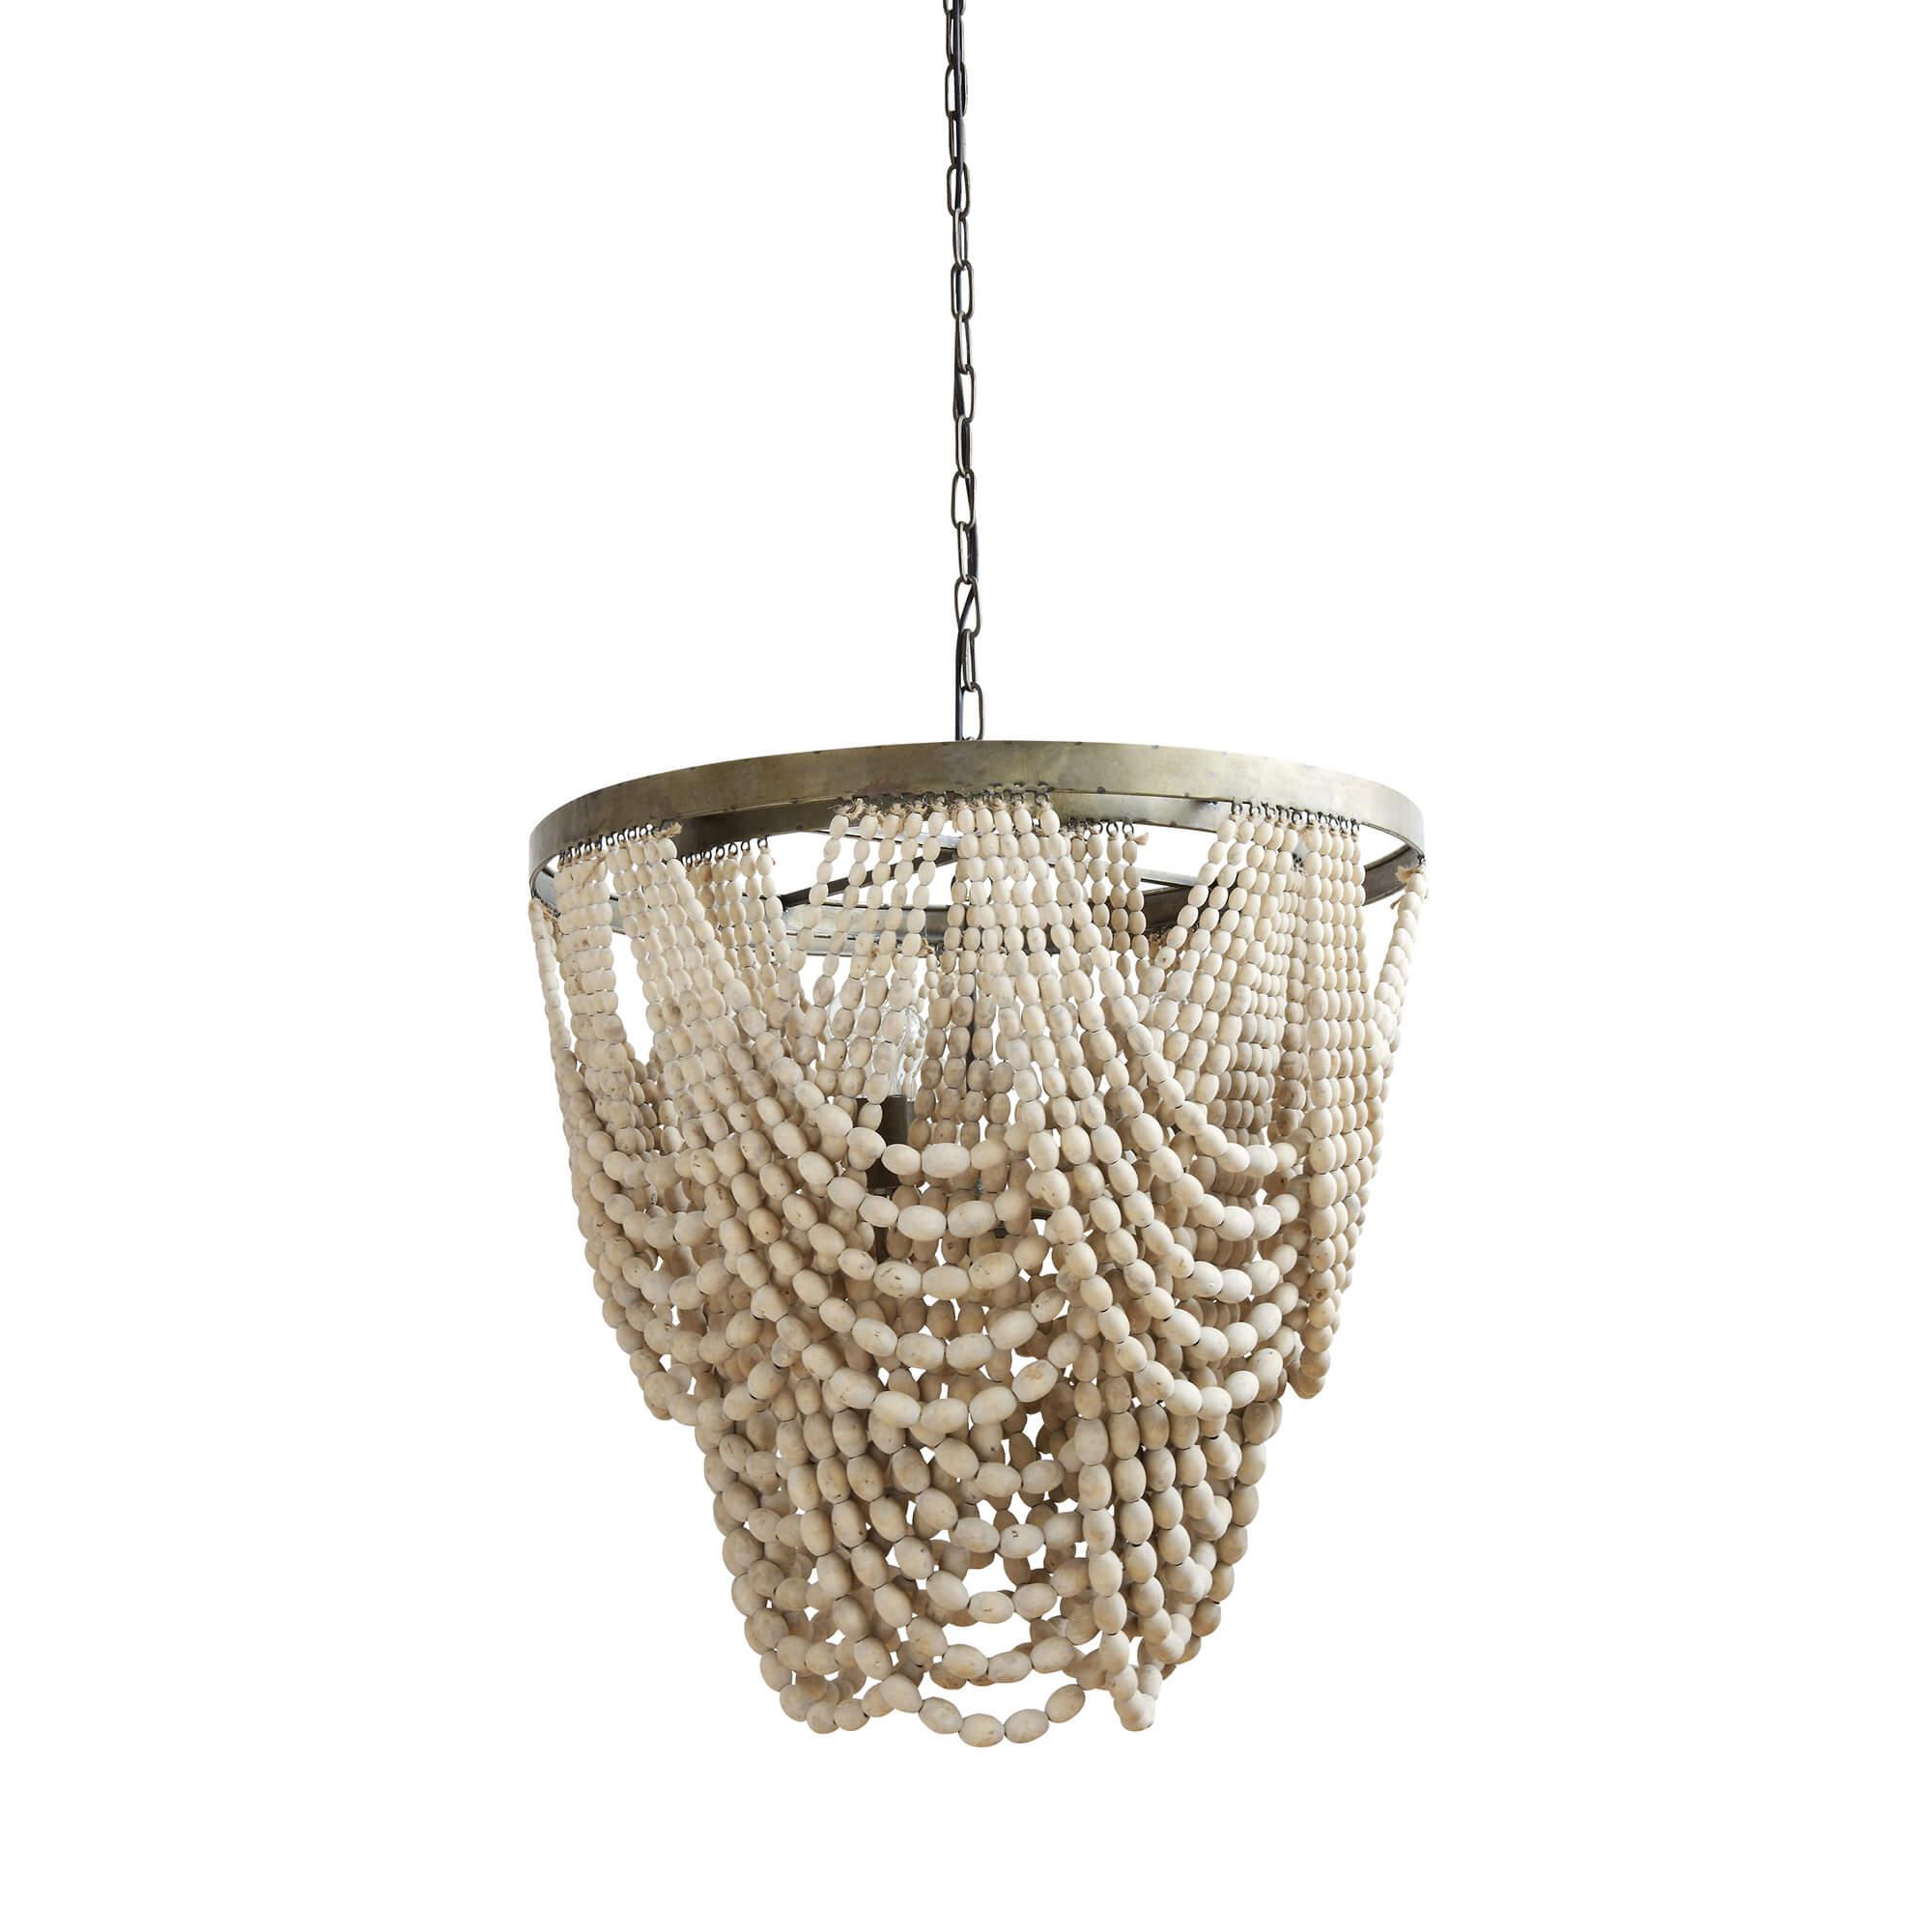 Creative Collection Creative Collection Fleur De Sel Loftlampe - Natur Træ Belysning